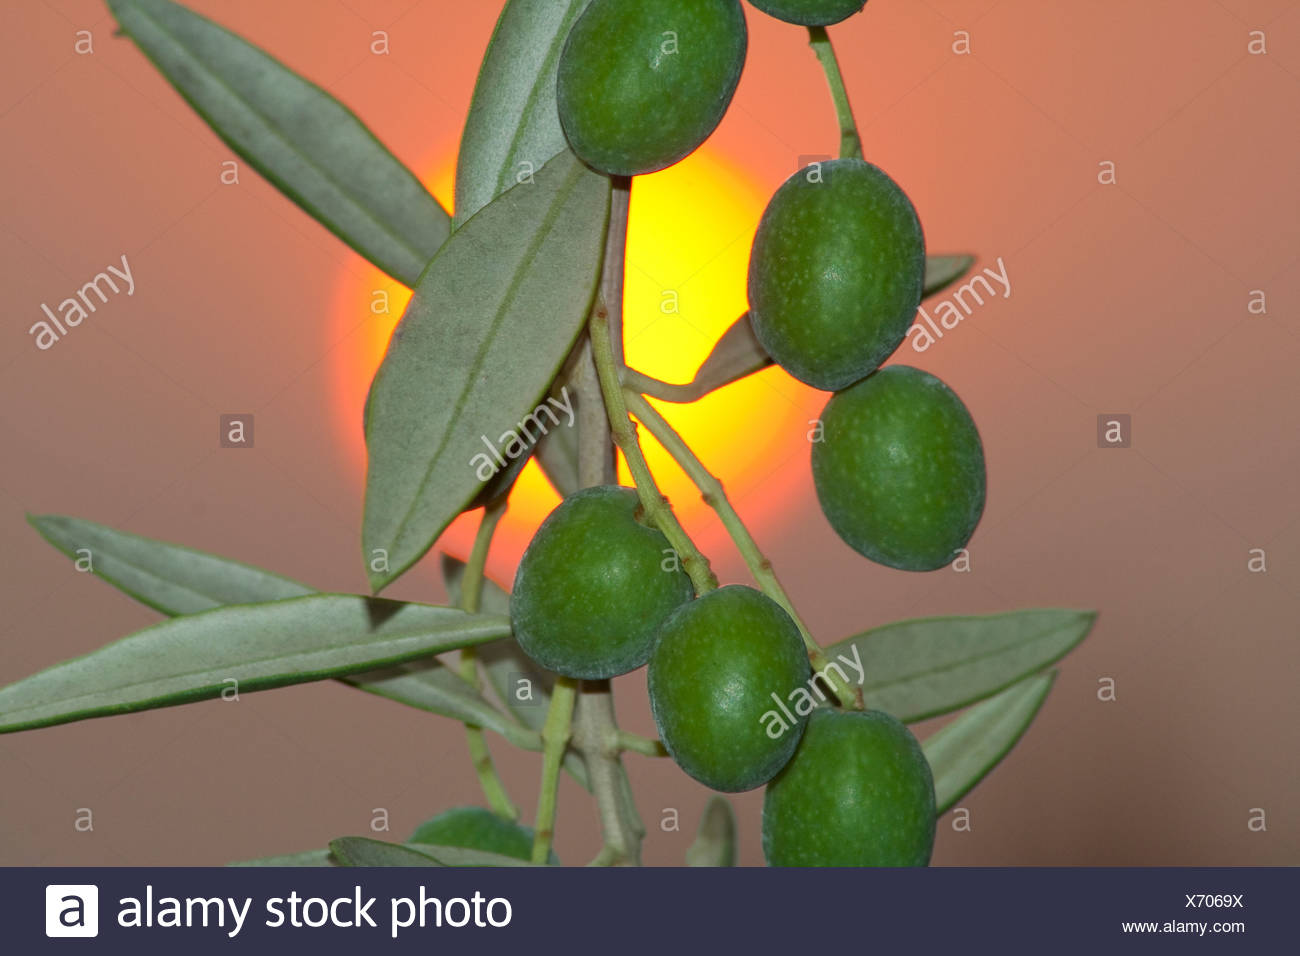 Manzanilla olives; aka Spanish olives, on the tree with the setting sun in the background / Tehama County, California, USA. - Stock Image